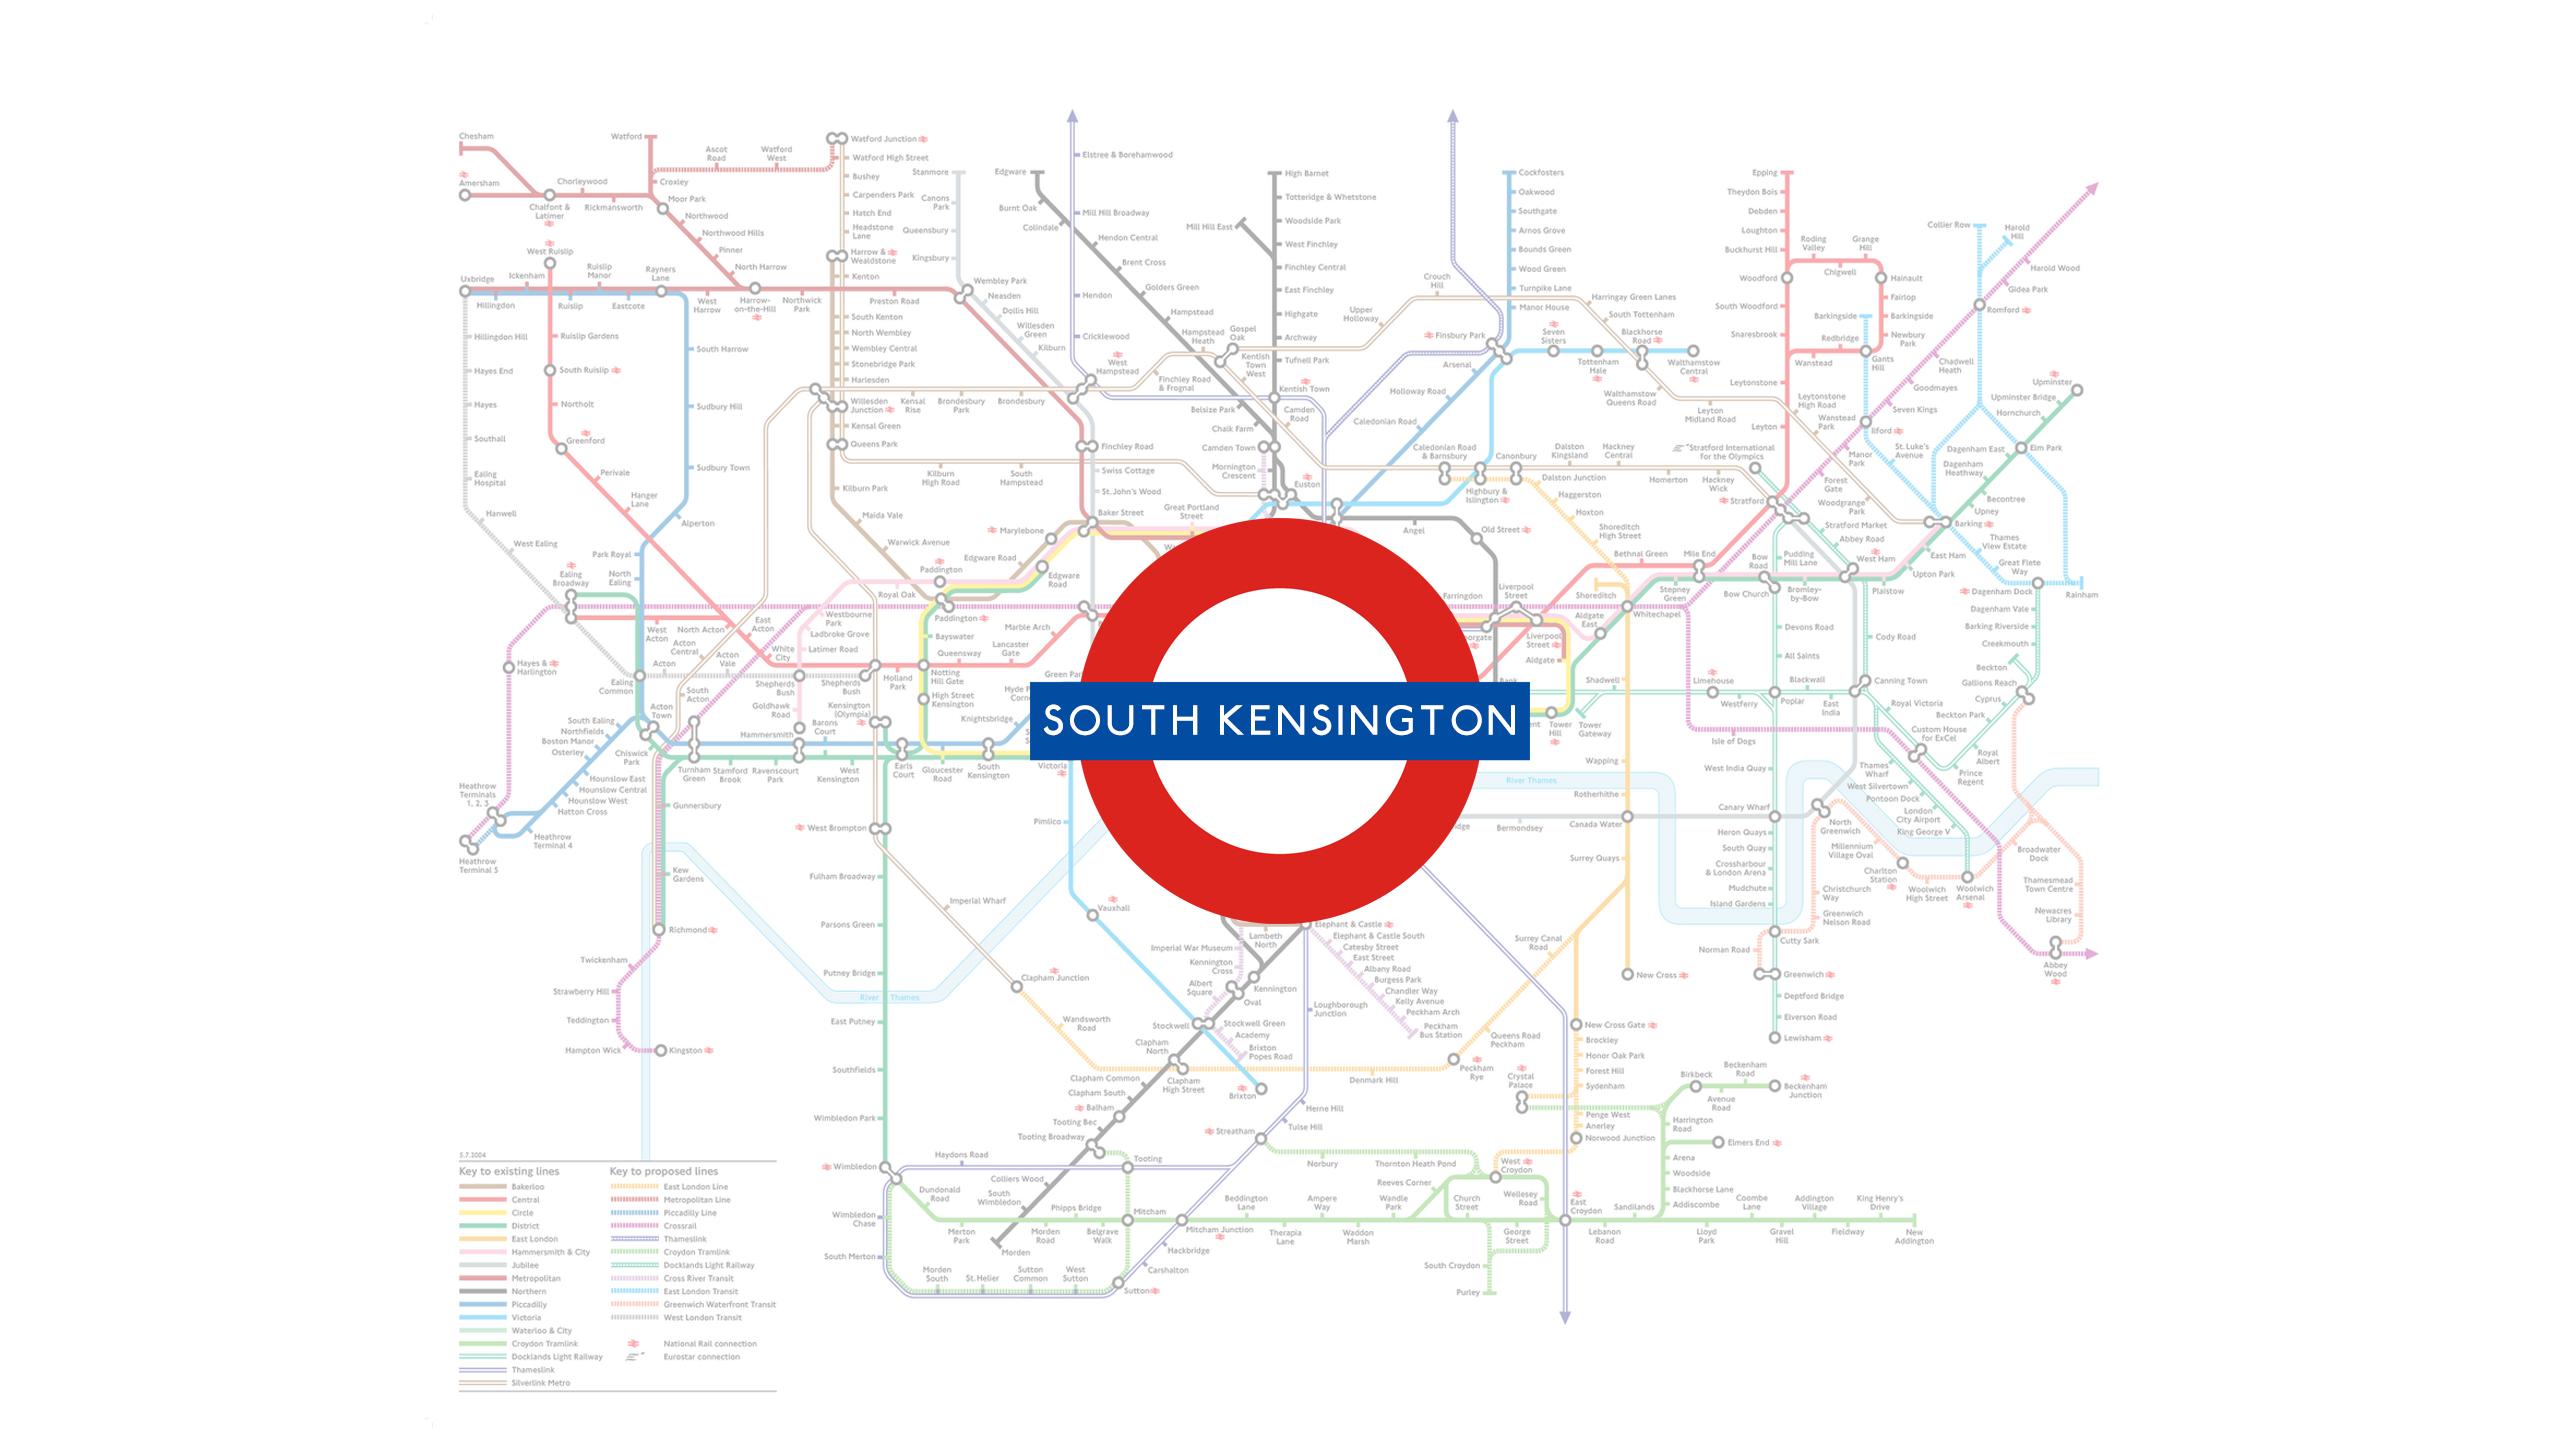 South Kensington (Map)